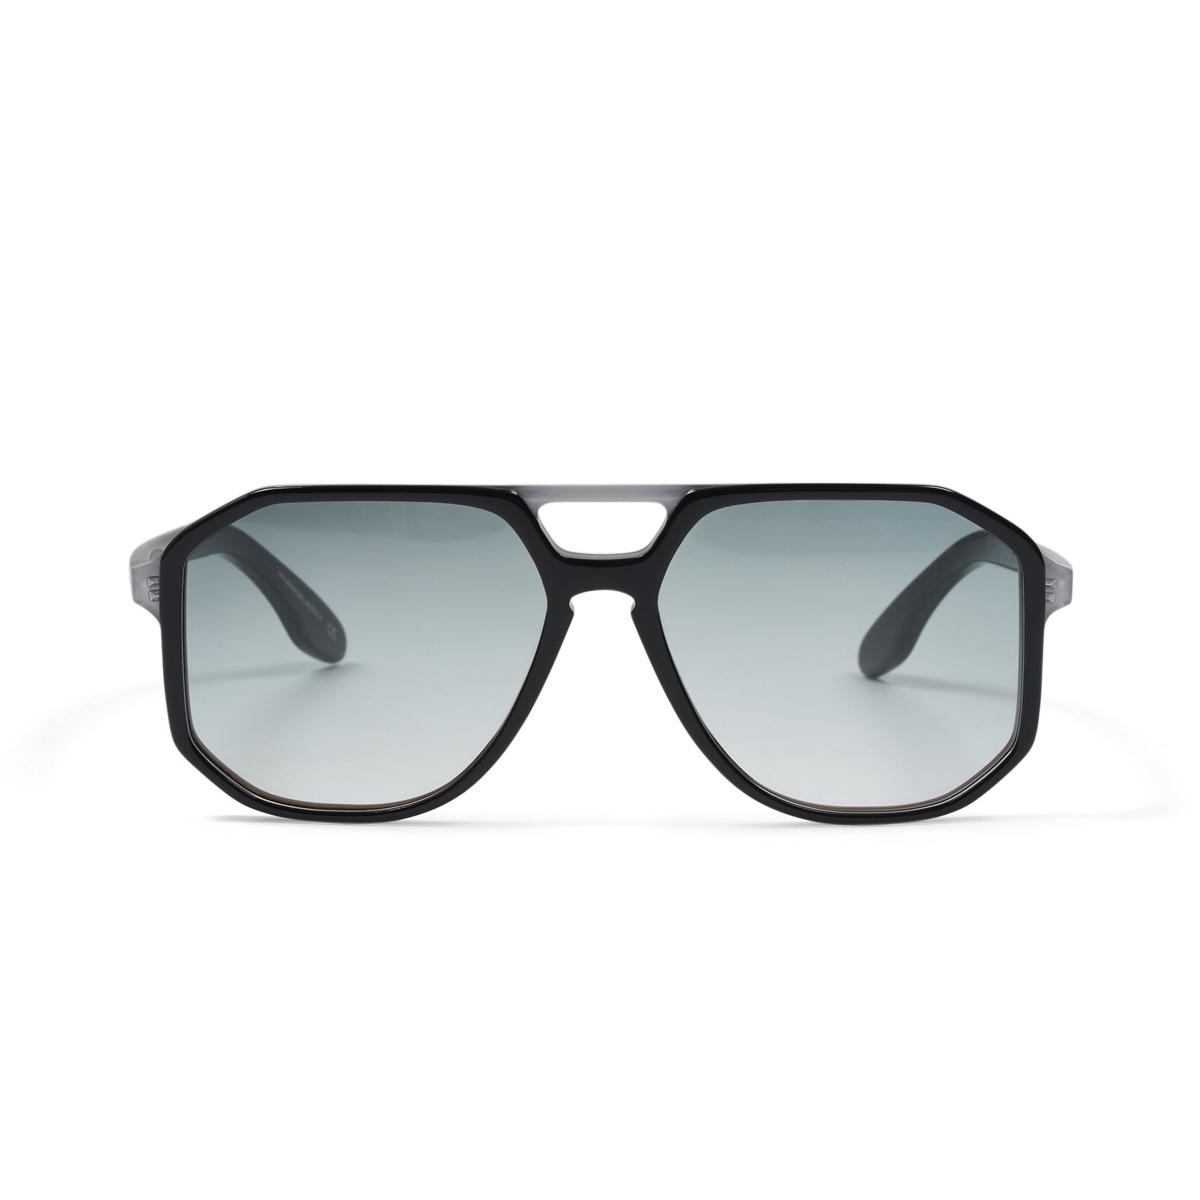 6c2fcfd659 Oliver Goldsmith Black and Brown Aviator Spillane Sunglasses